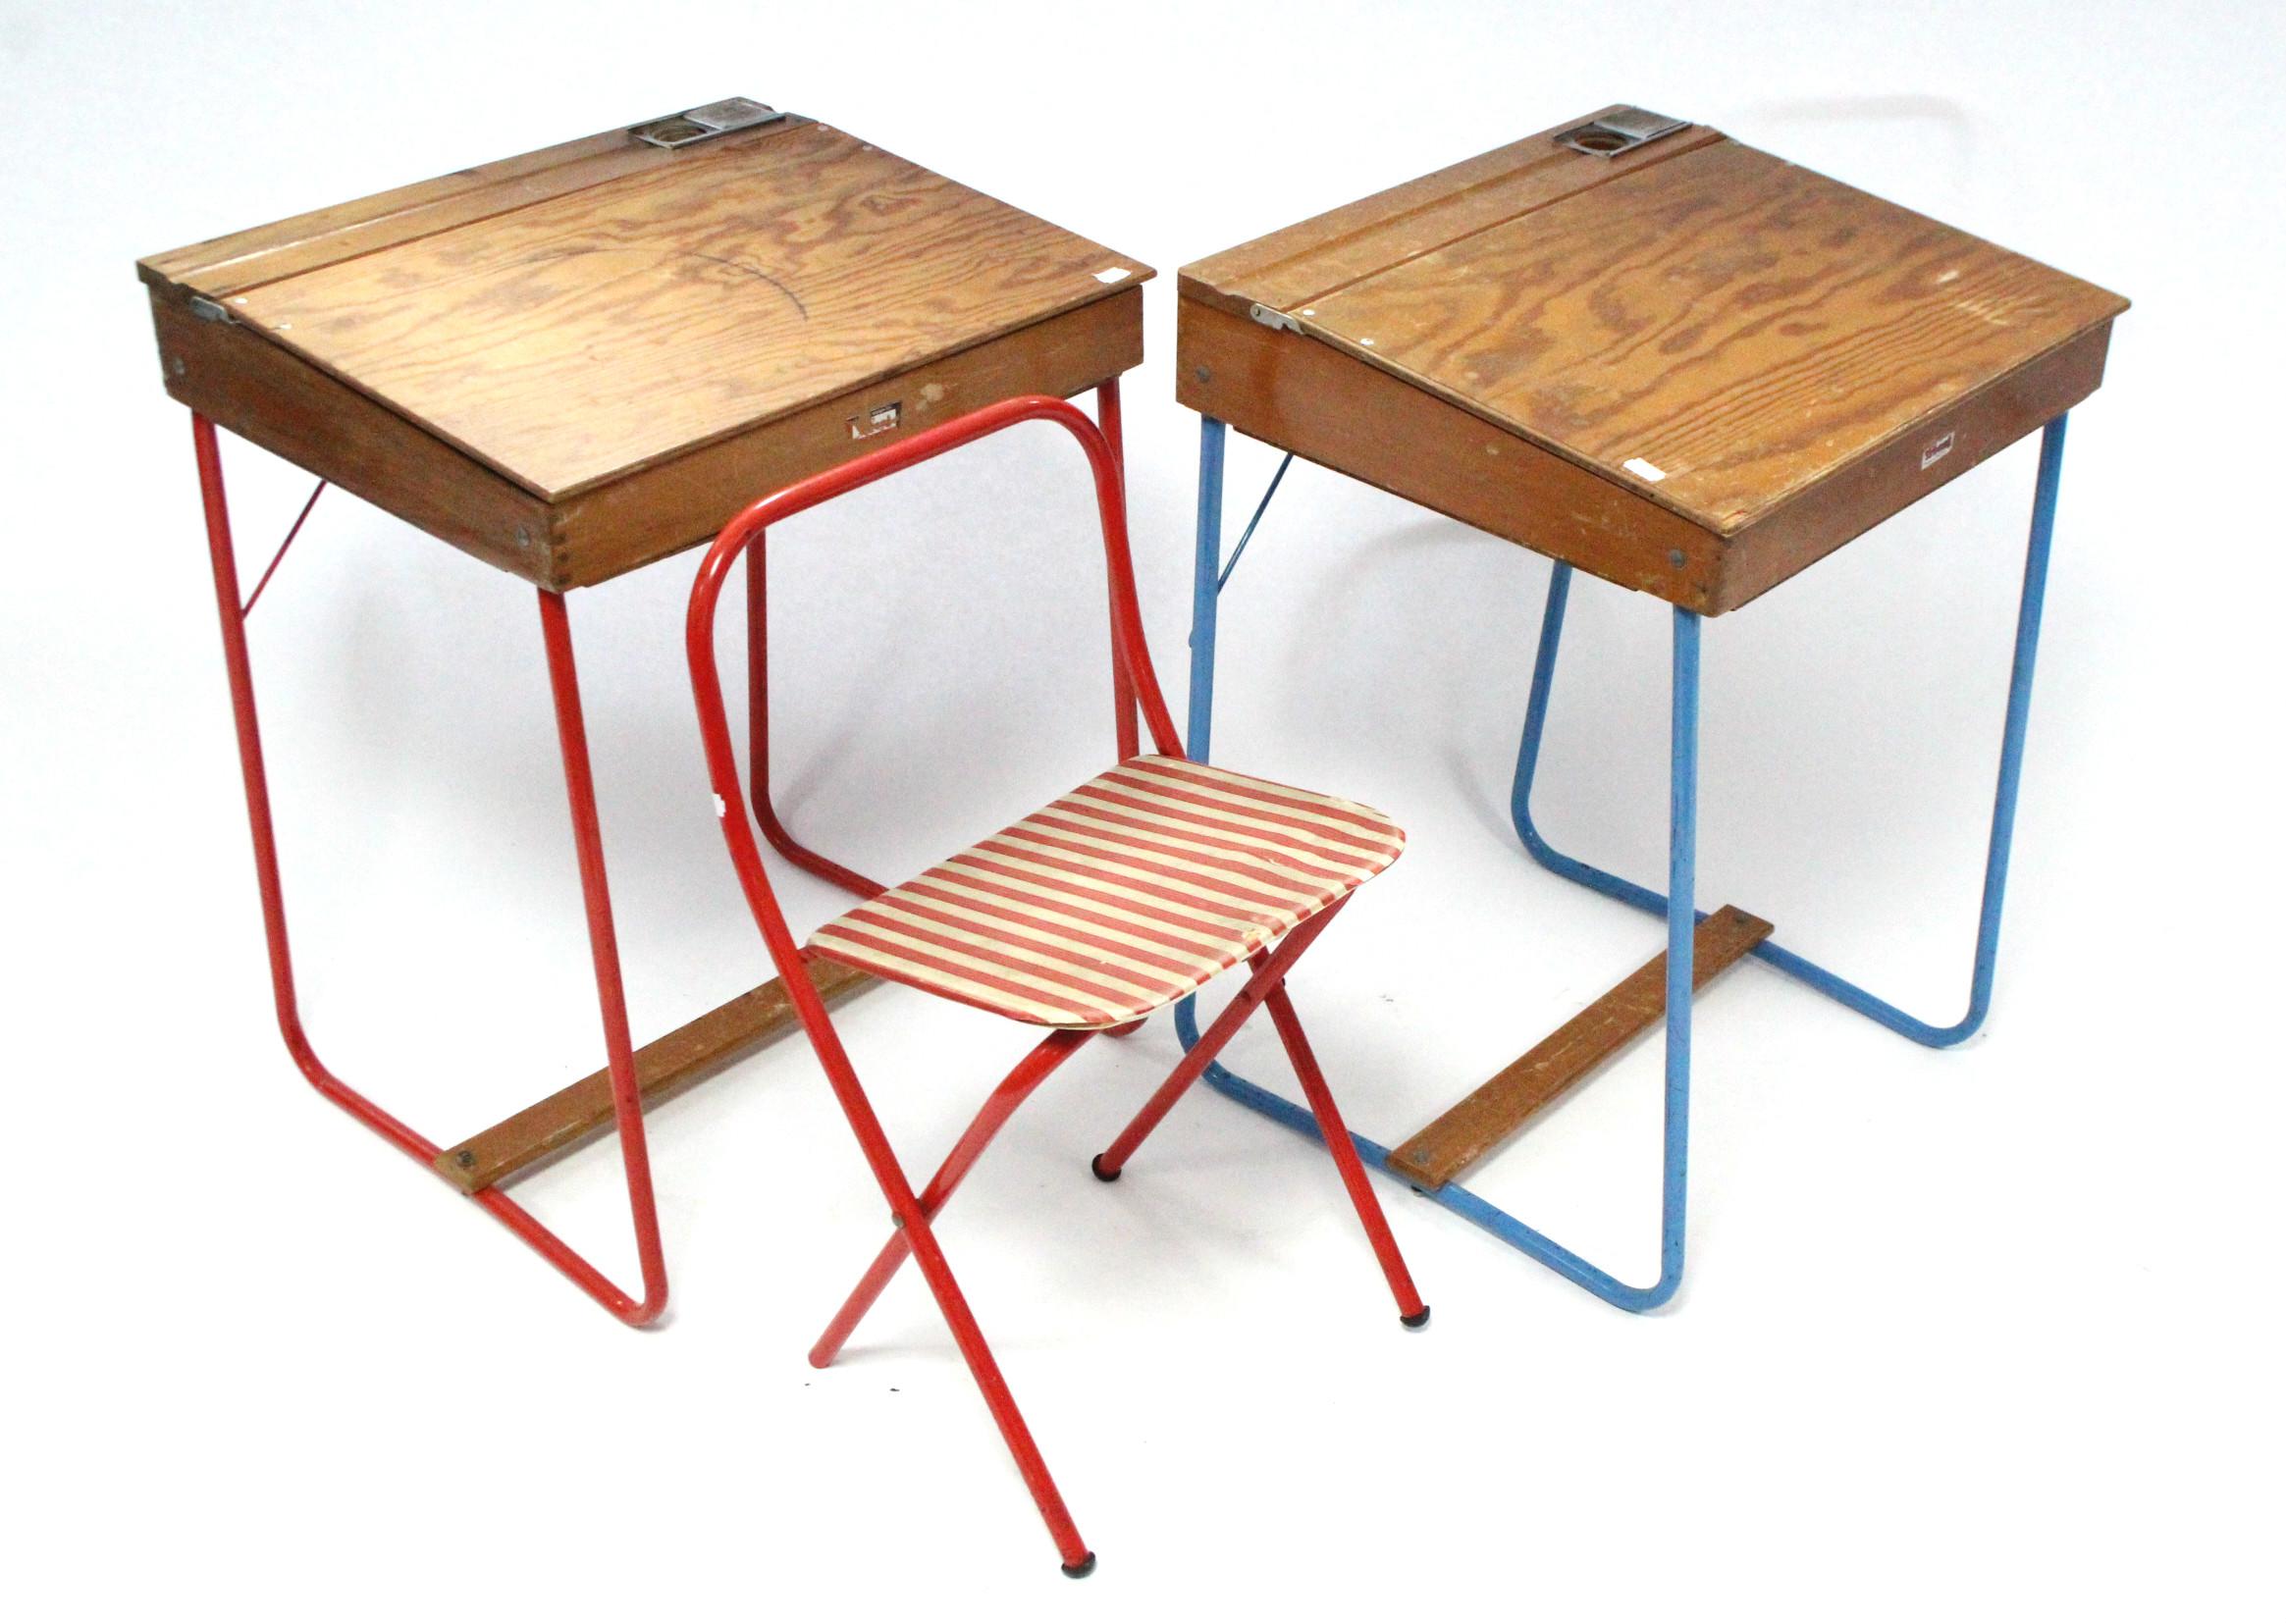 Lot 241 - Two Tri-ang tubular-metal & wooden child's desks; & a tubular-metal folding child's chair.